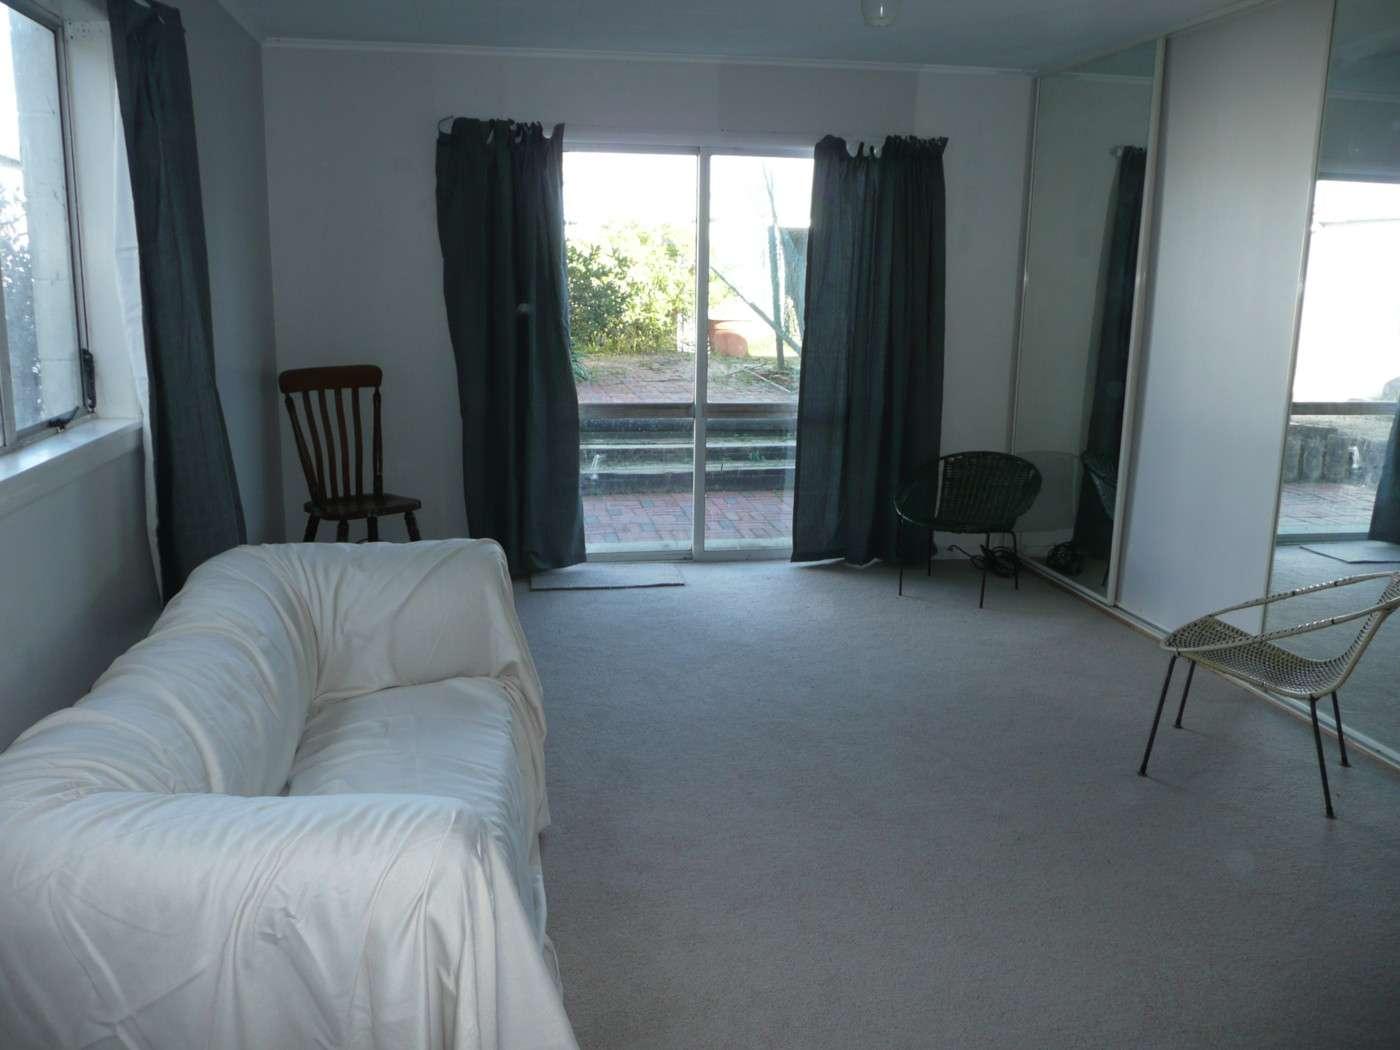 37A Rosamund Road, NEW WINDSOR, Auckland City 0600